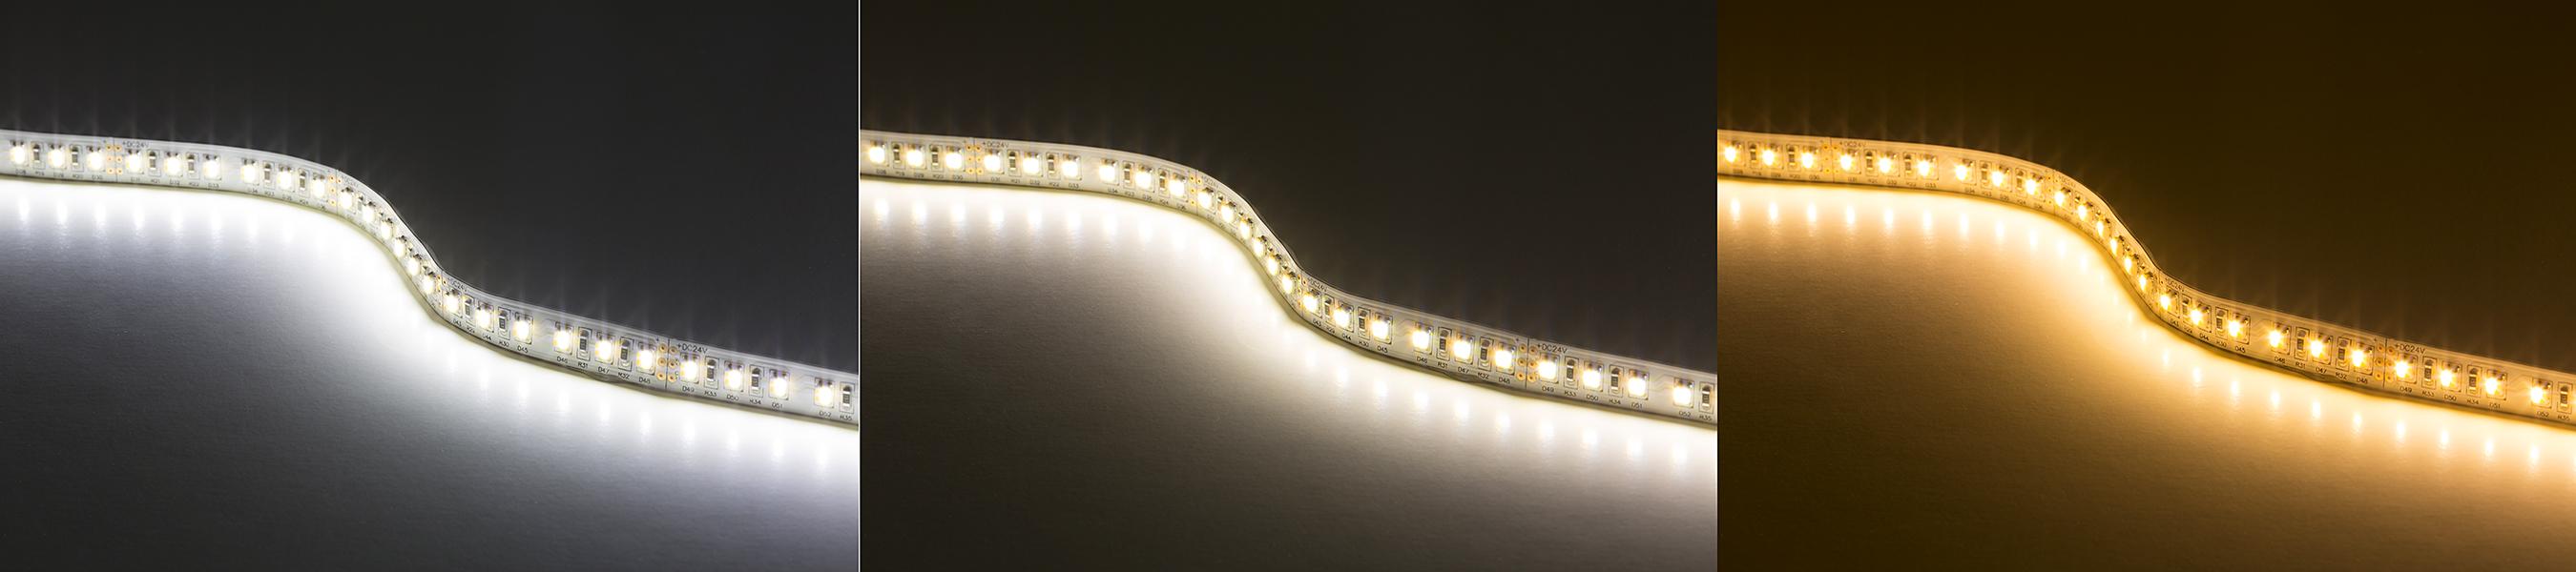 Tunable White LED Strip Light Kit   Color Temperature Changing 24V LED Tape  Light   511 Lumens/ft.